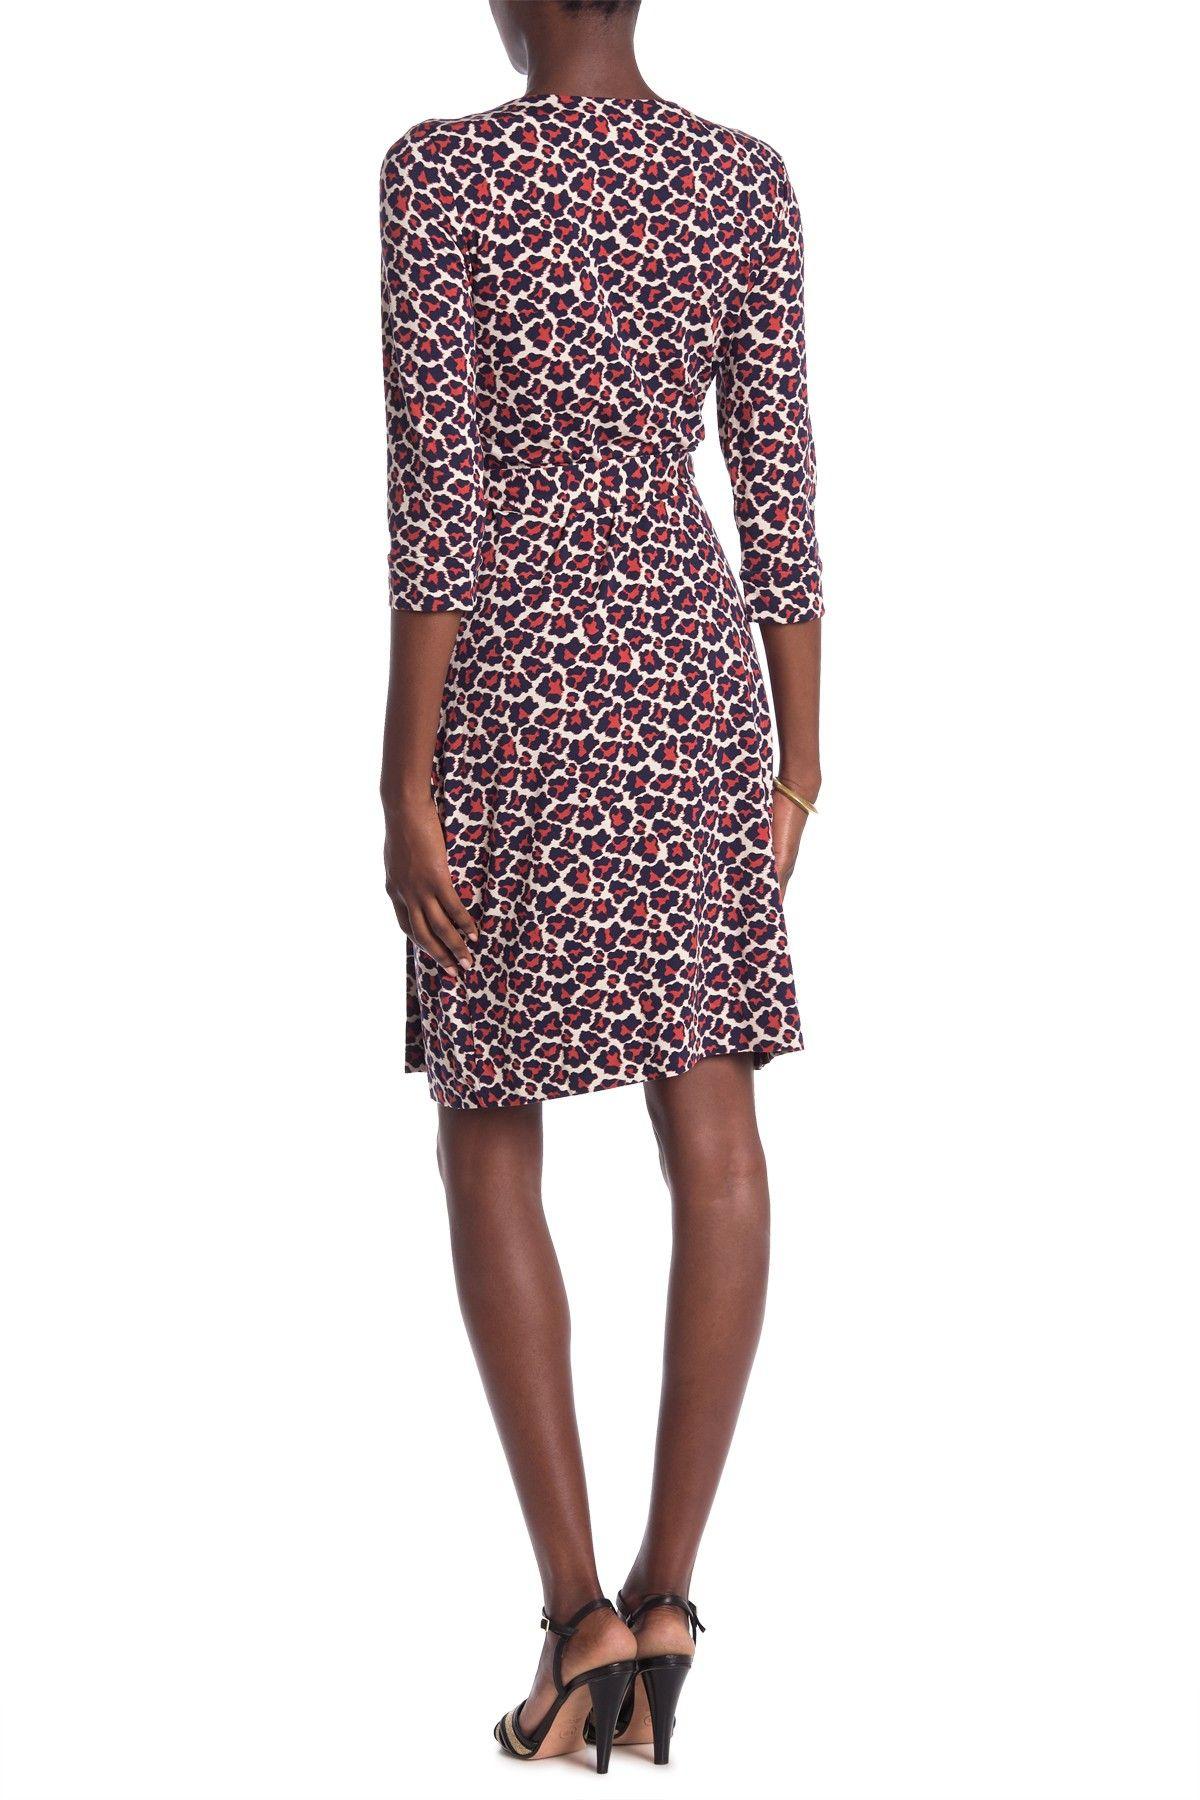 Diane Von Furstenberg New Julian Leopard Print Wrap Dress Hautelook Leopard Print Wrap Dress Printed Wrap Dresses Dresses [ 1800 x 1200 Pixel ]